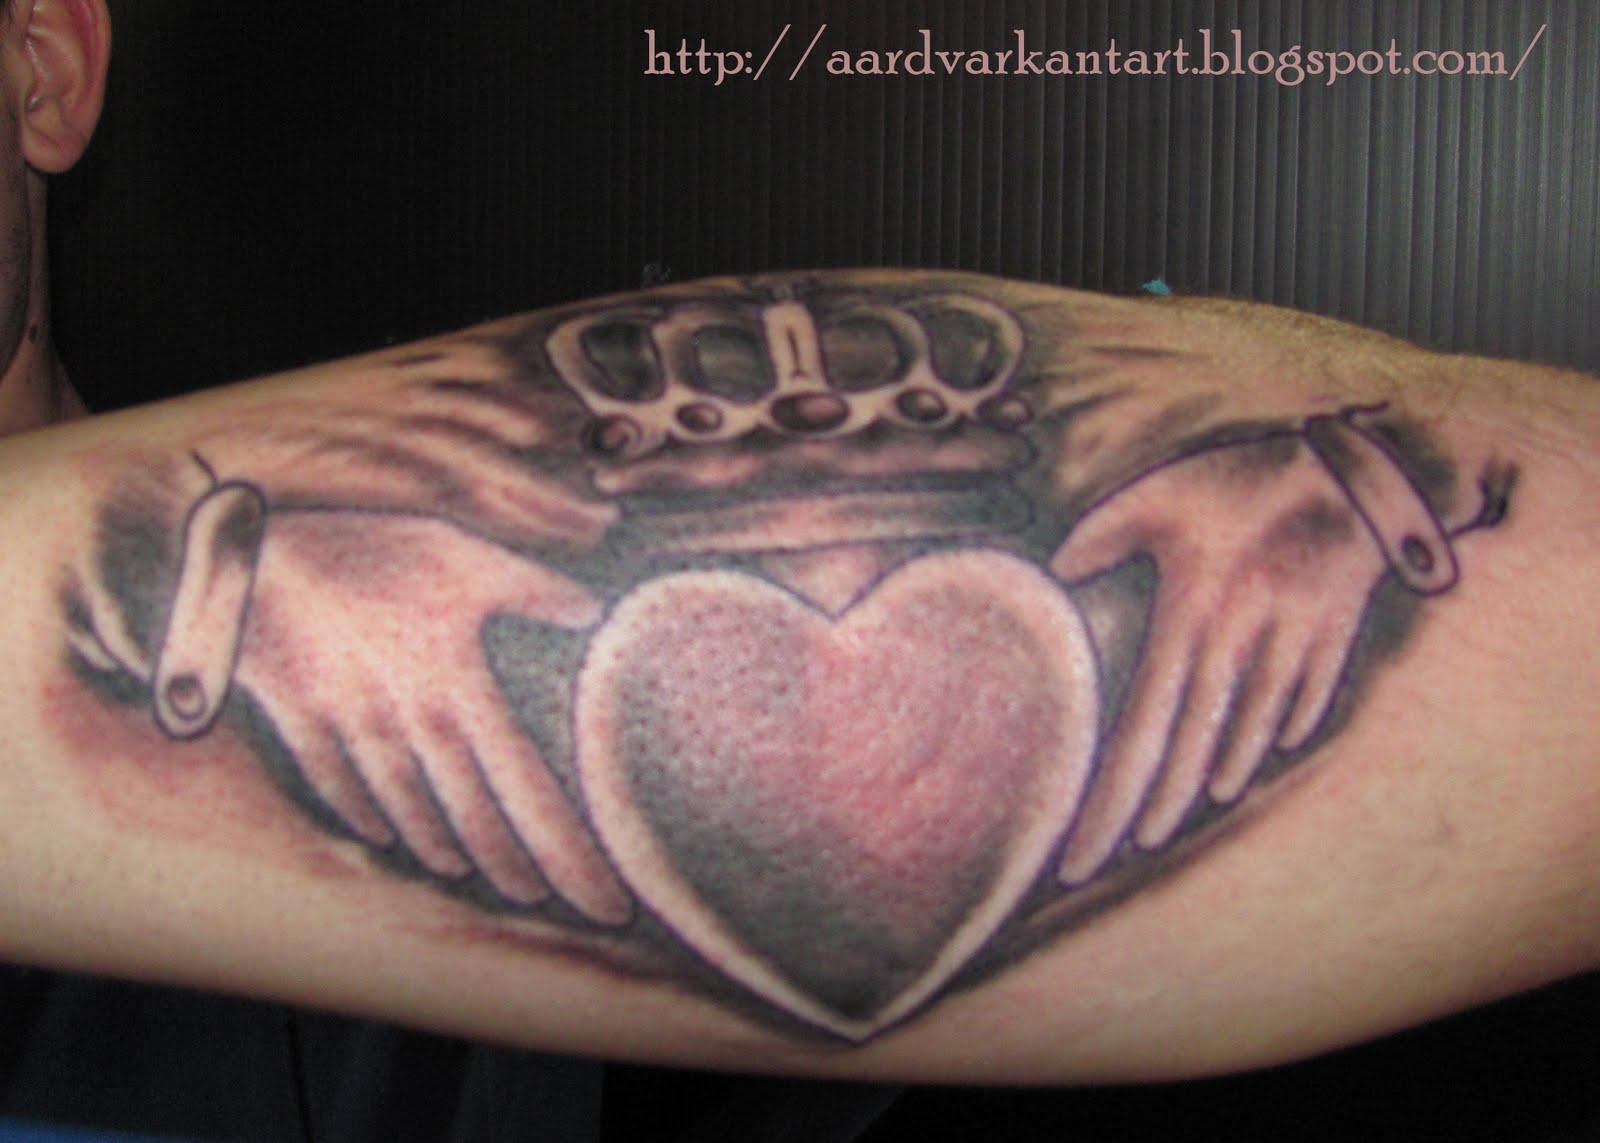 http://1.bp.blogspot.com/-b8uammPh8xo/TanC_cA0KmI/AAAAAAAAAK8/nszAzZaIN0c/s1600/claddagh+tattoo.jpg